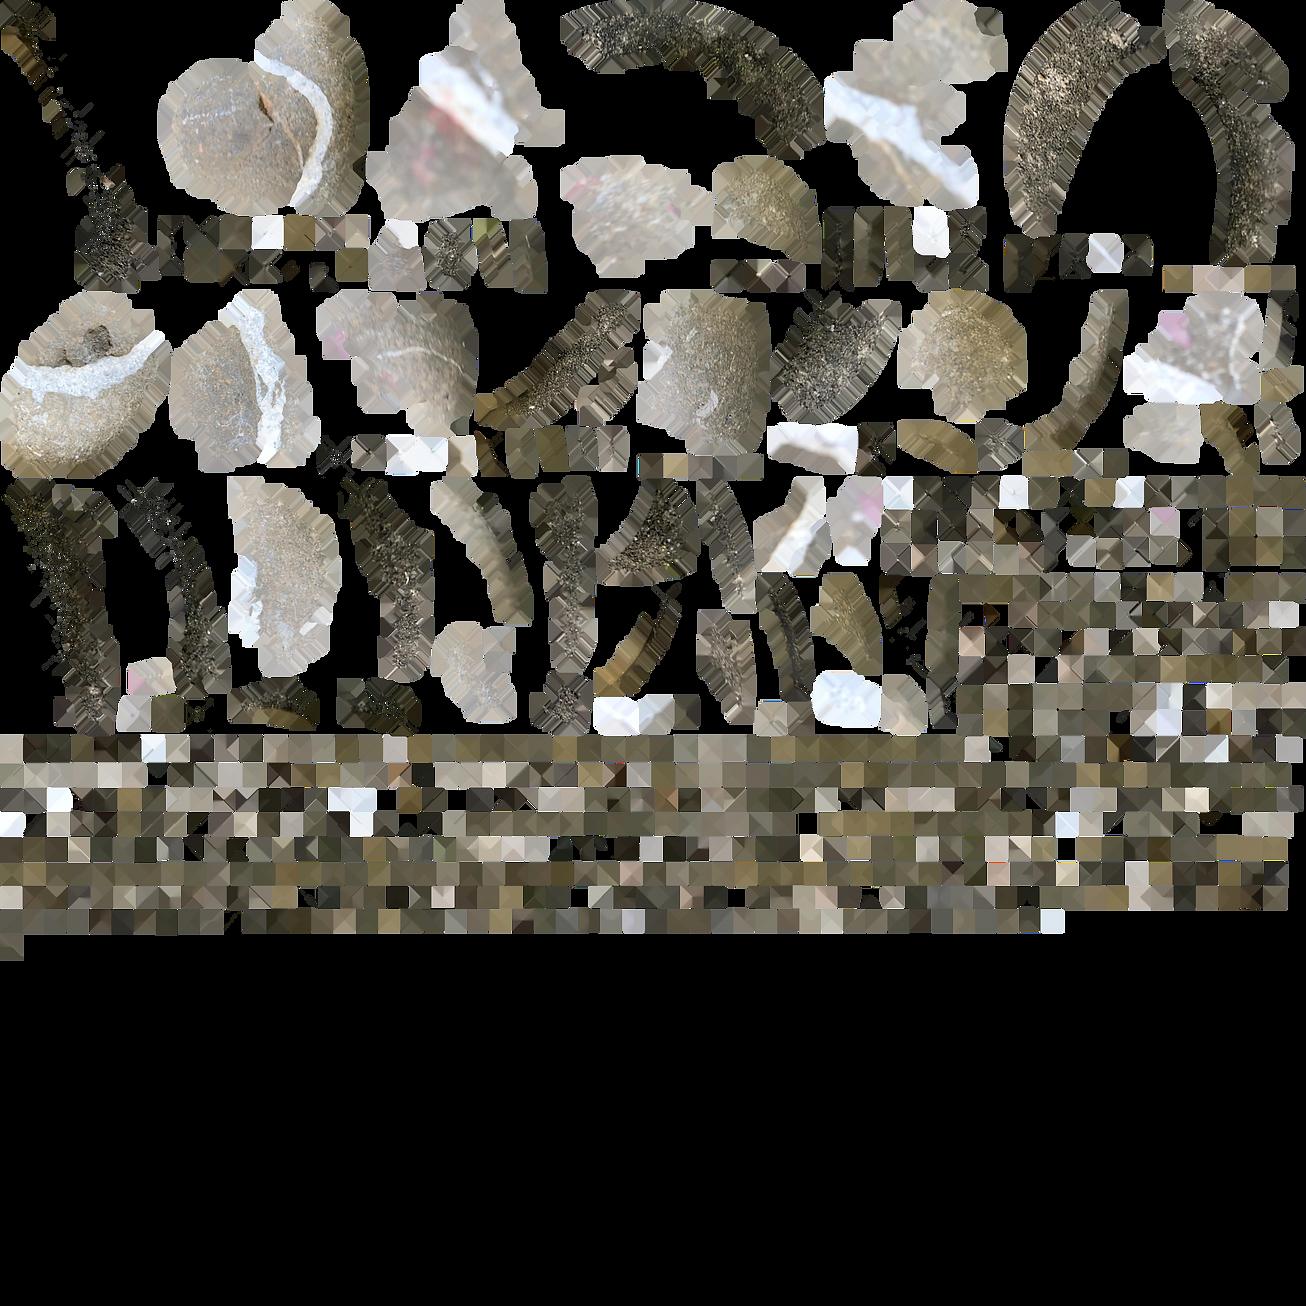 texture0_transp.png